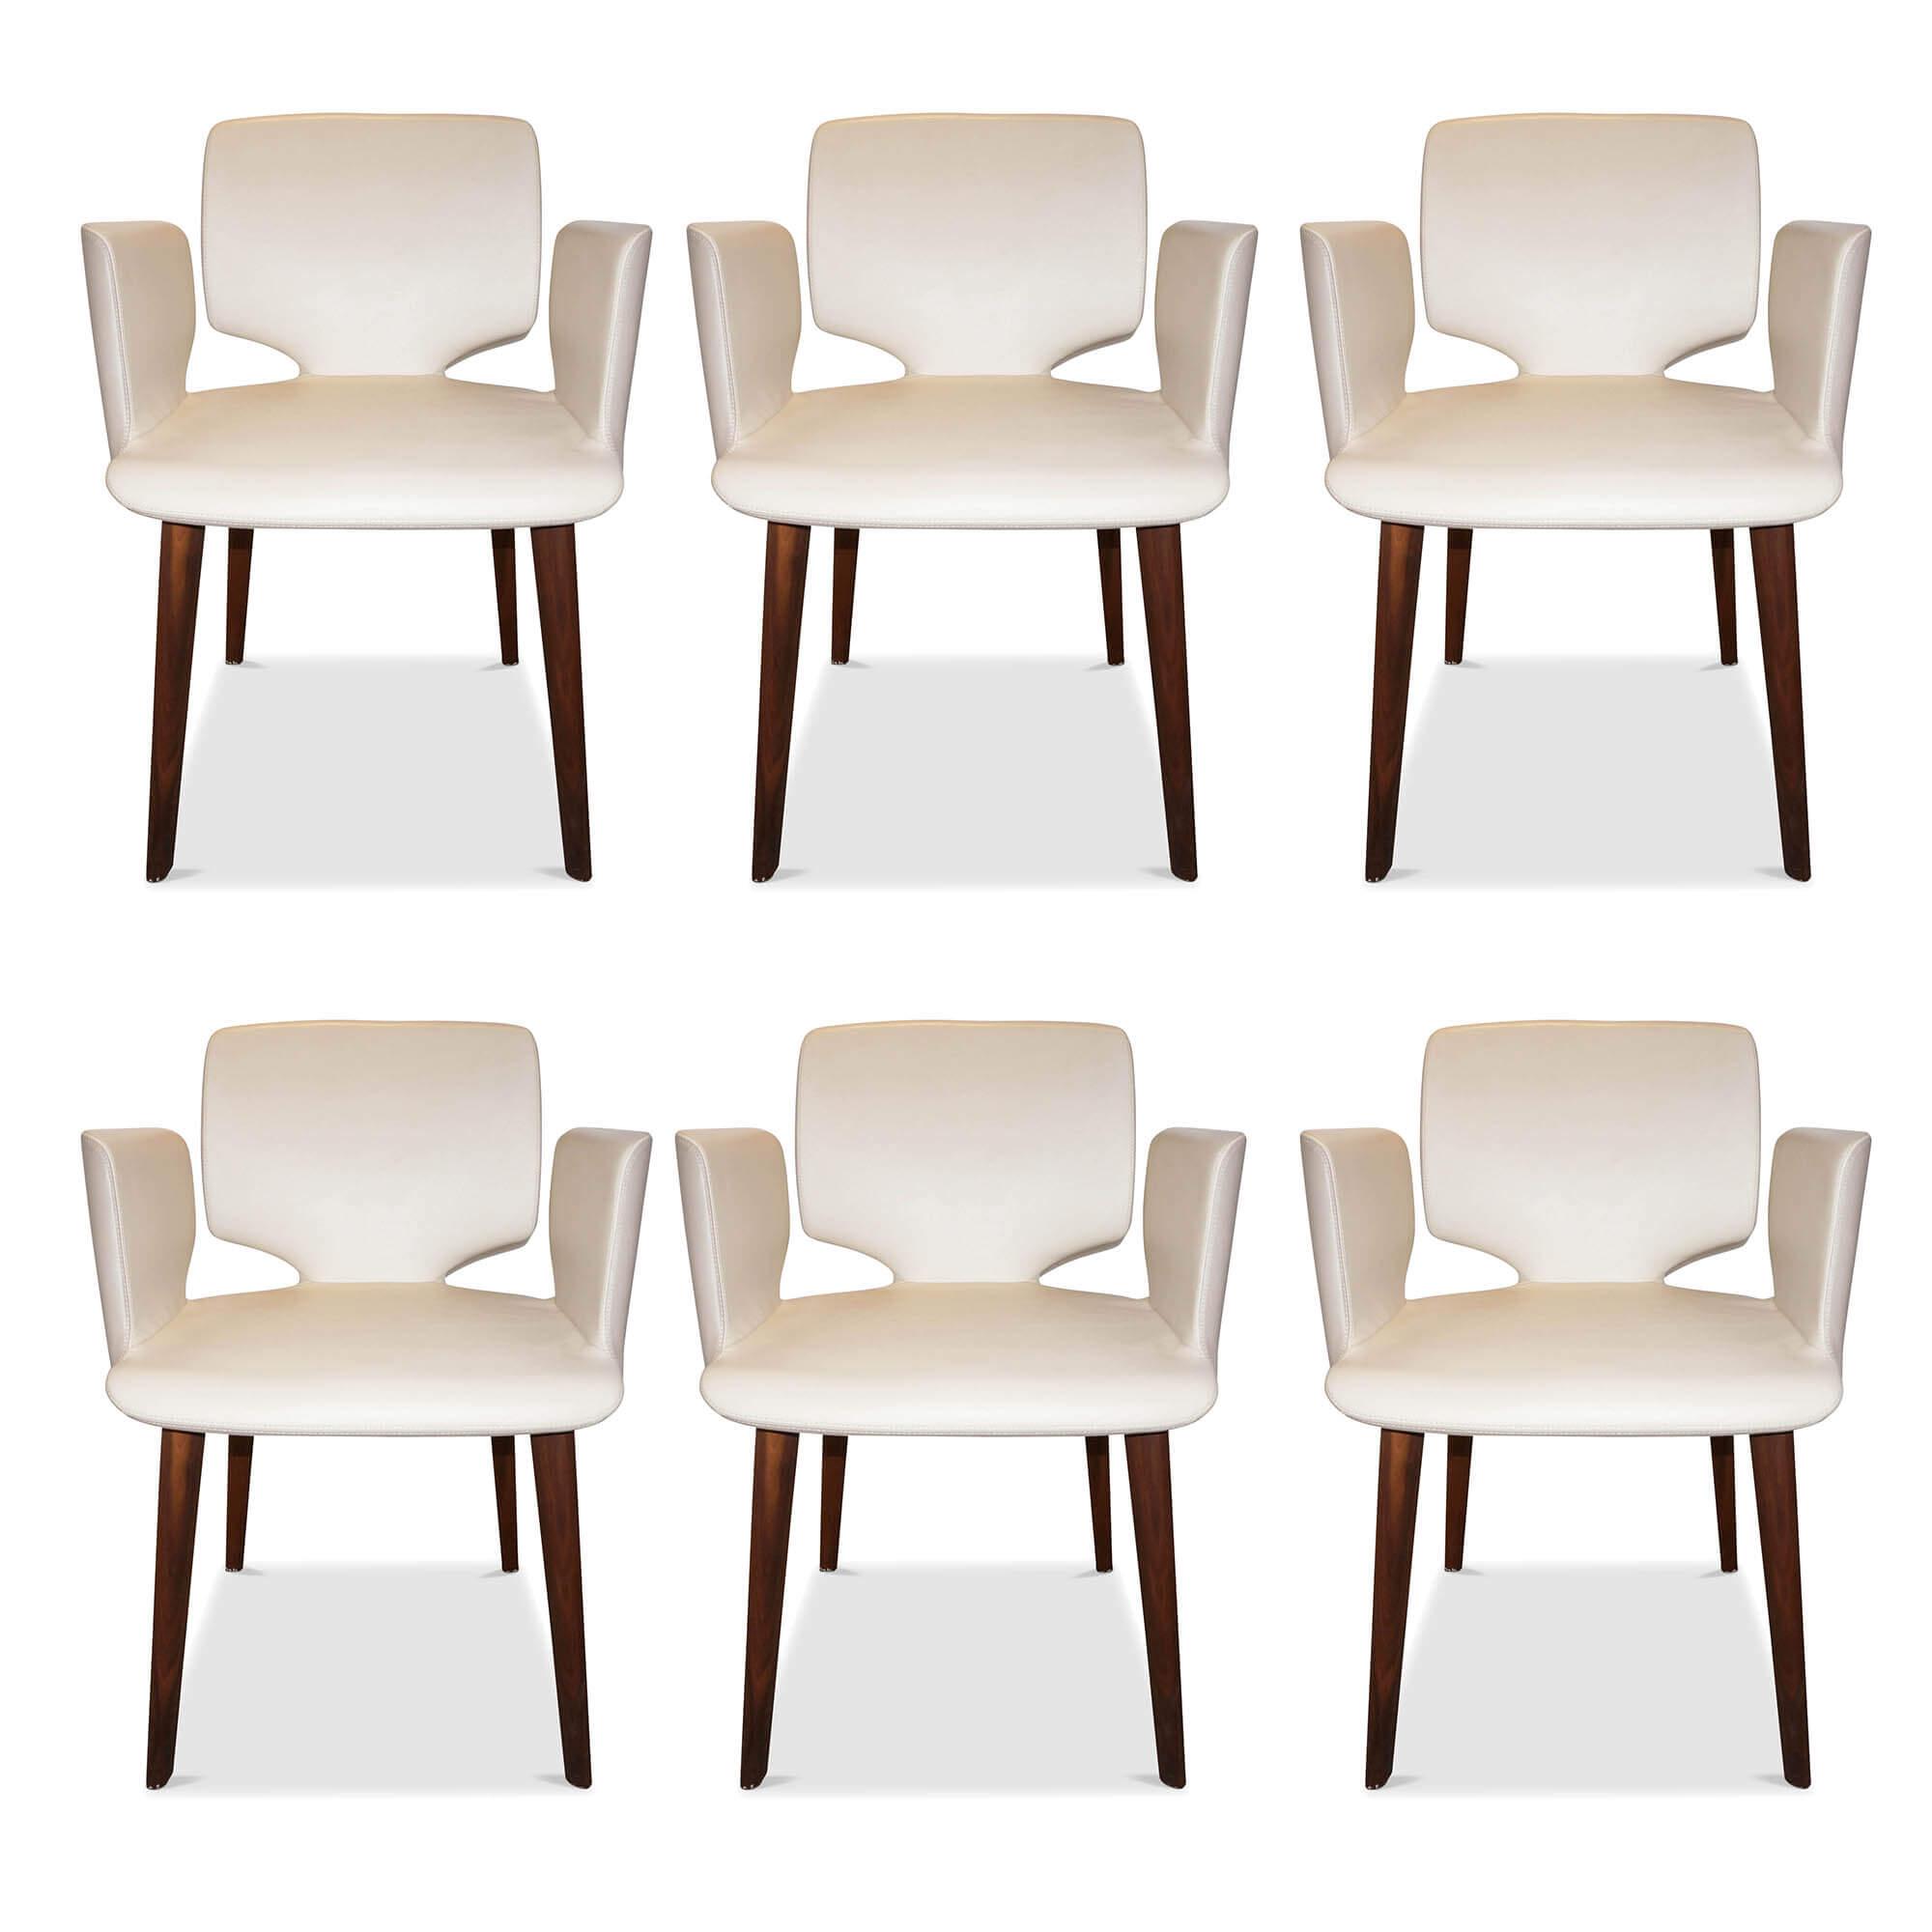 team 7 ausstellungsst cke angebote online g nstig. Black Bedroom Furniture Sets. Home Design Ideas